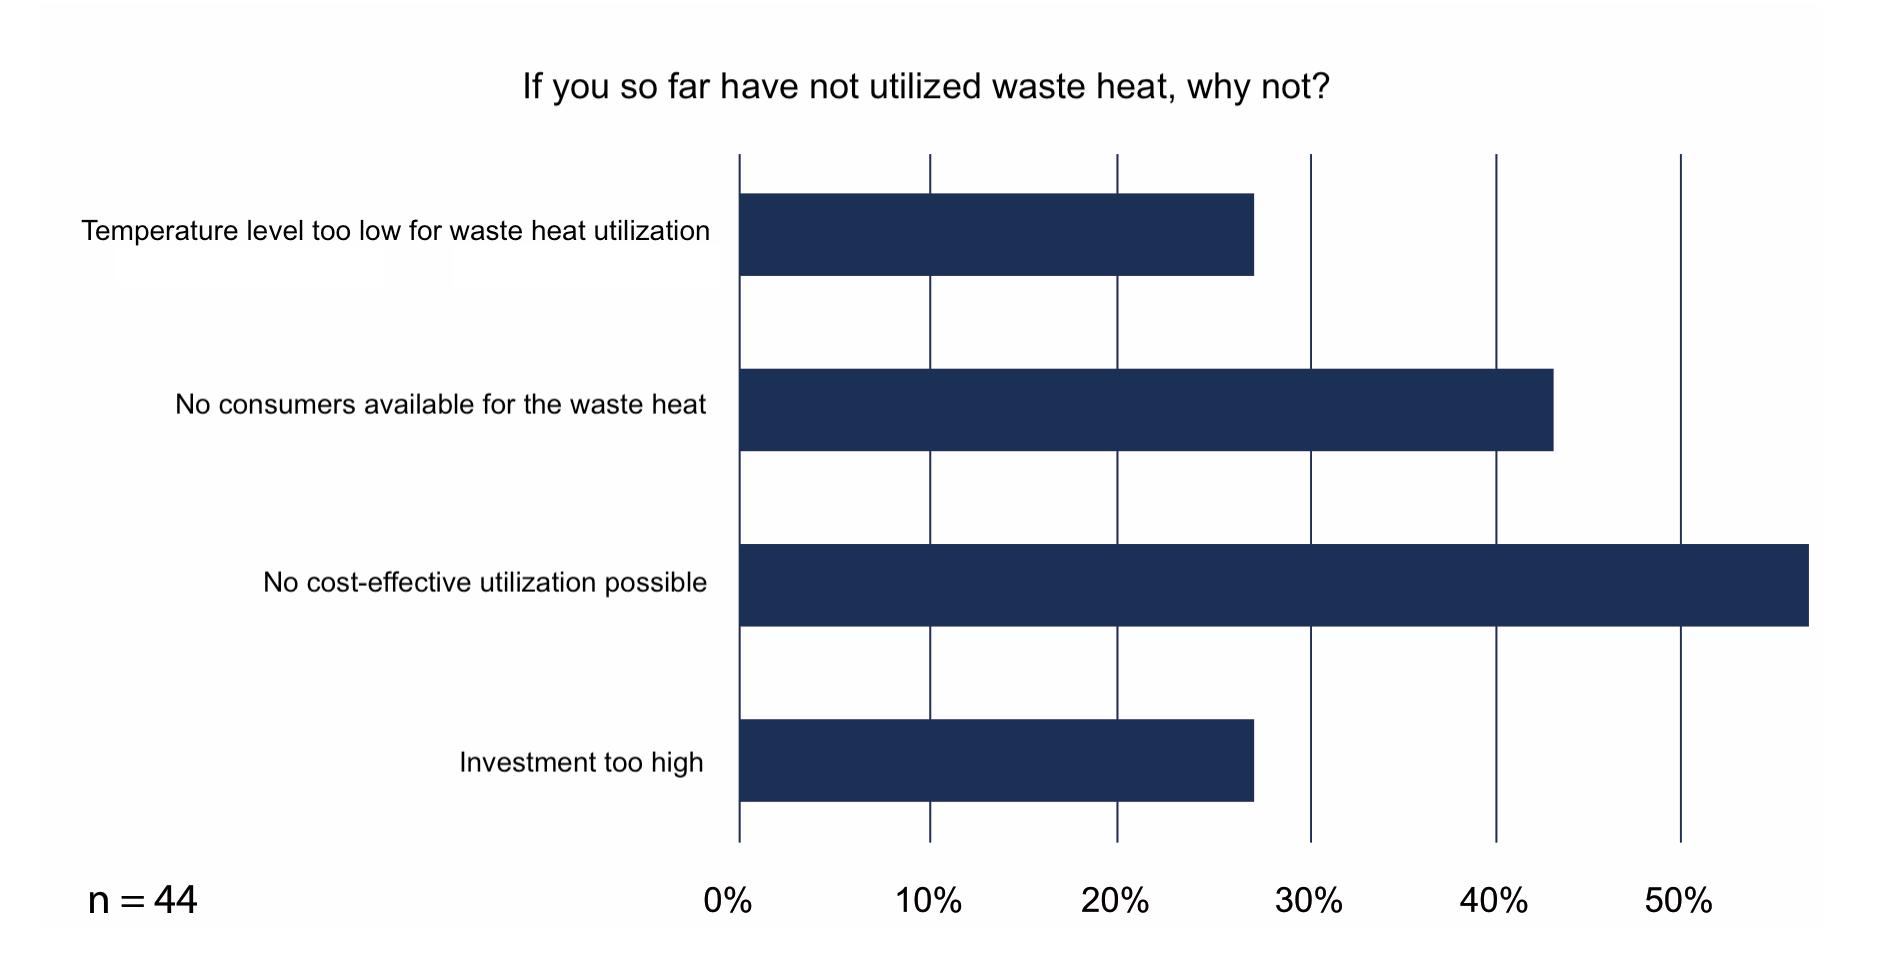 White Paper: Utilization of Waste Heat in the Data Center